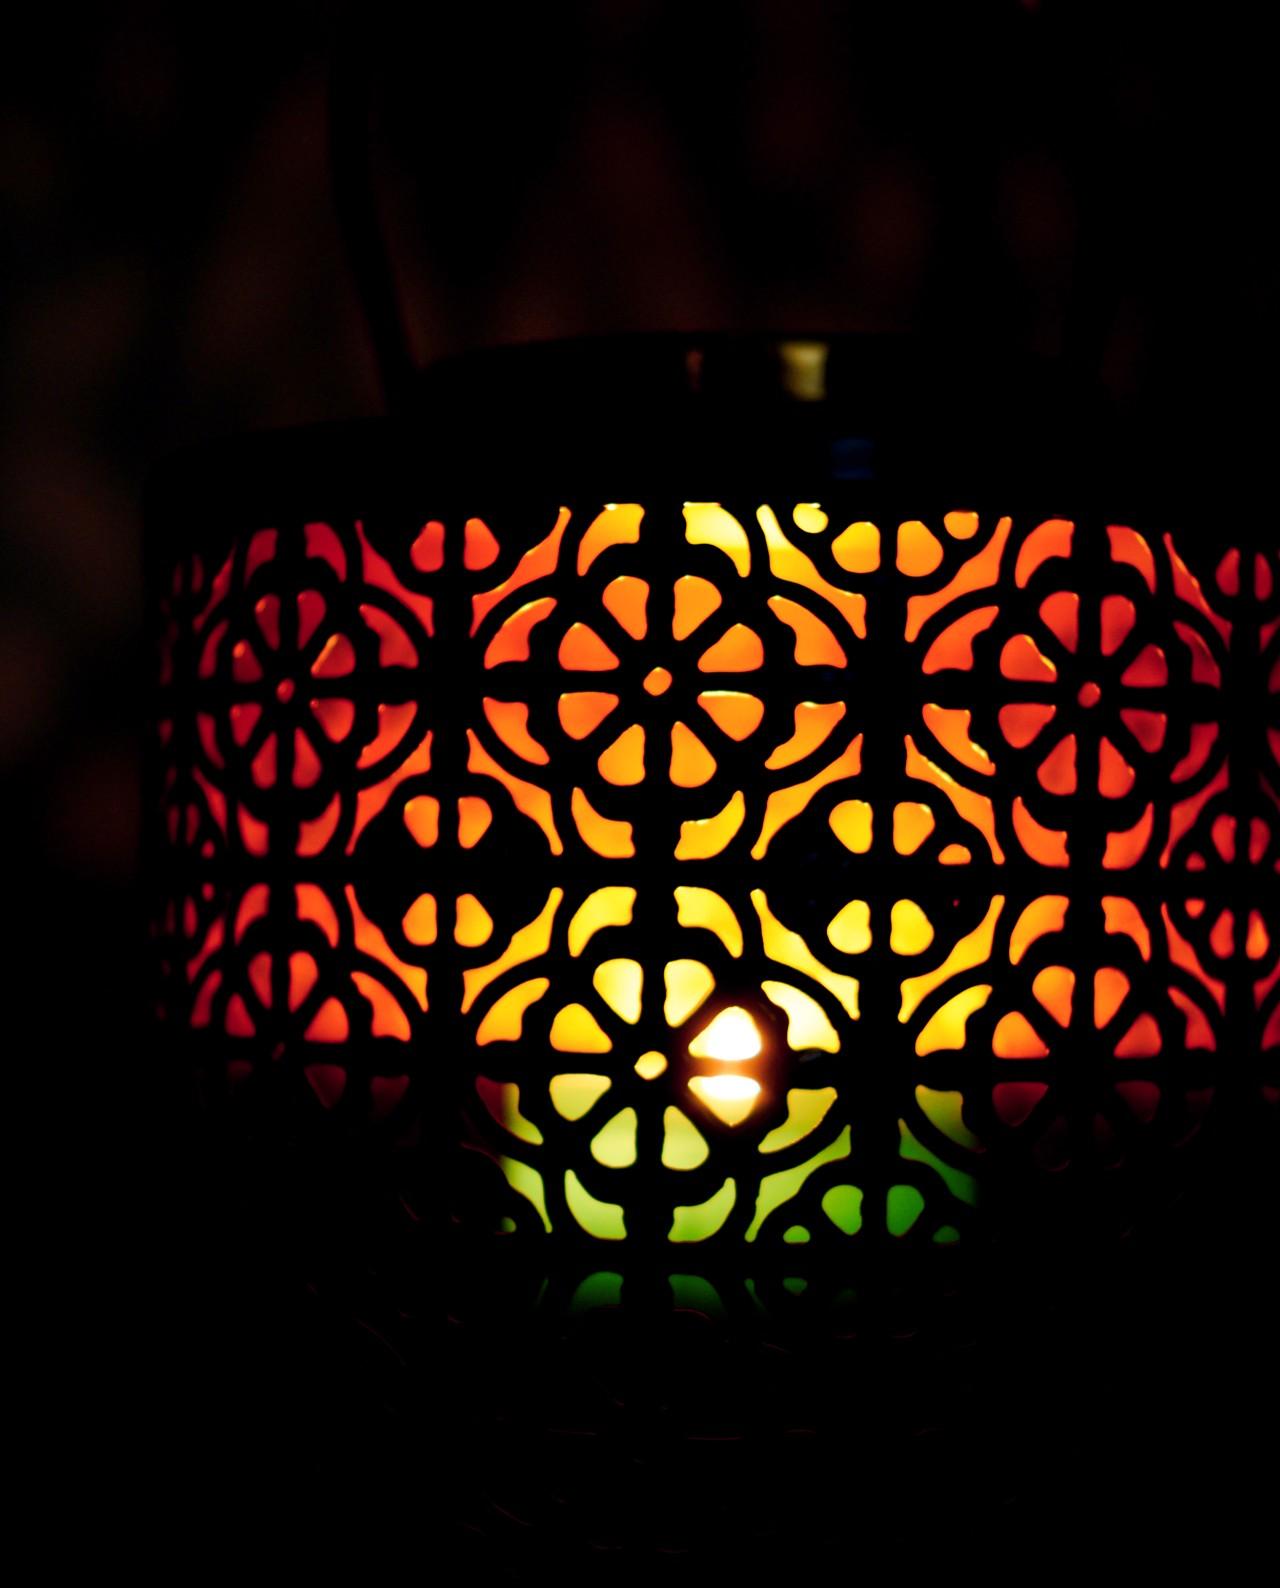 Lantern made of metal in light pastel green color